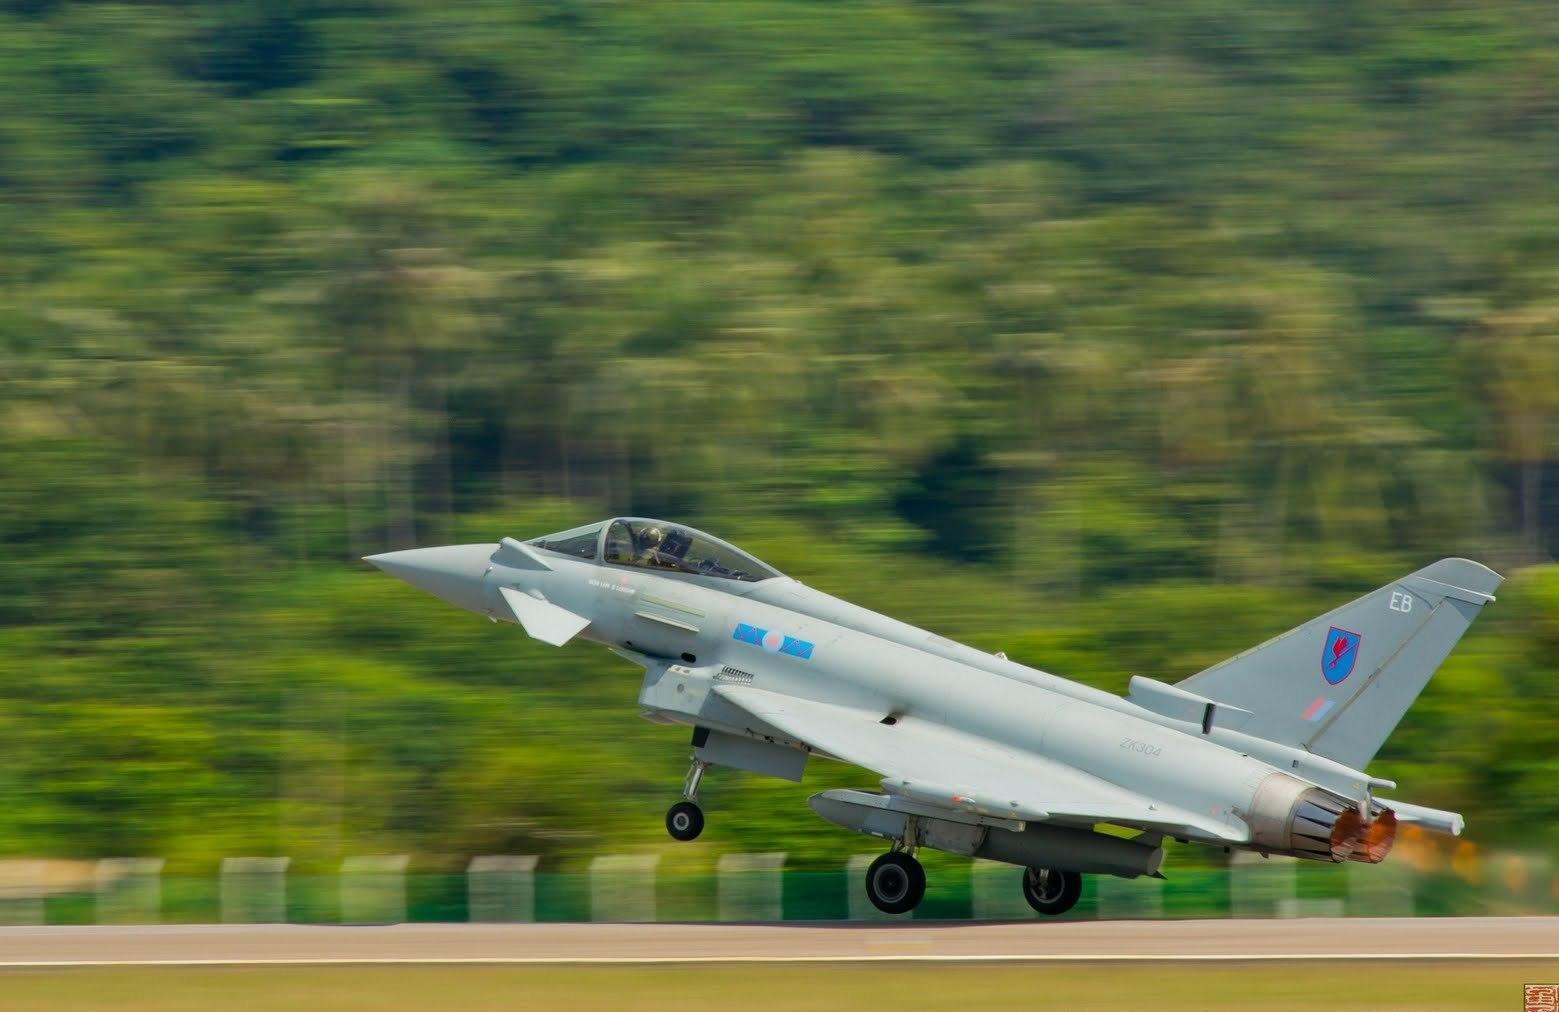 http://3.bp.blogspot.com/-XM_kT6sgfr4/T4DNsrleaNI/AAAAAAAAH2E/MOGlfes7Y_I/s1600/eurofighter_typhoon_royal_air_force.jpg